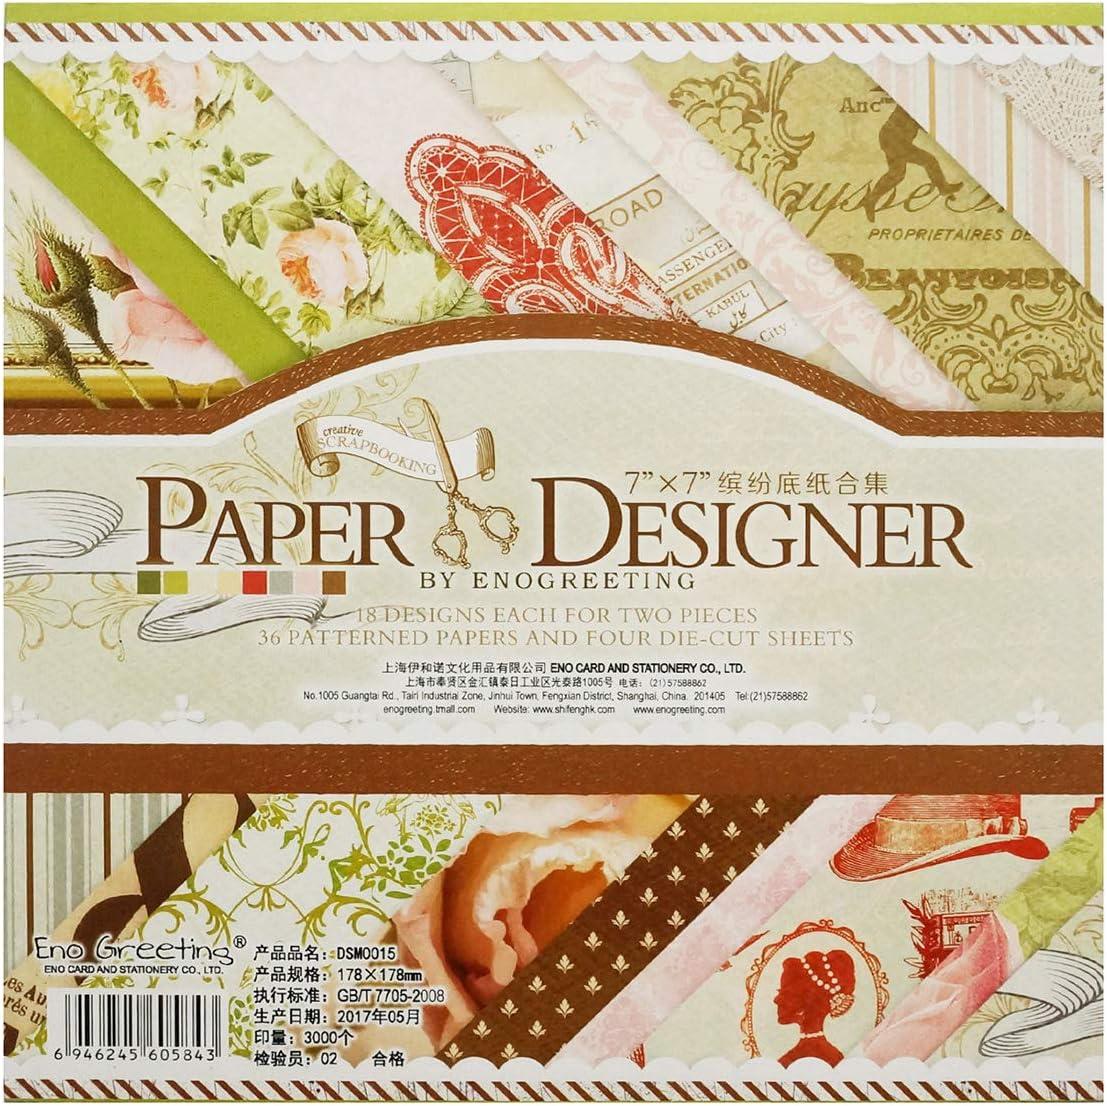 Gnognauq Album Carta Scrapbooking Fogli Carta Scrapbooking Decorativi Paper Cartoncini DIY Carta Decorativa Carta per Fai da Te Stile 8